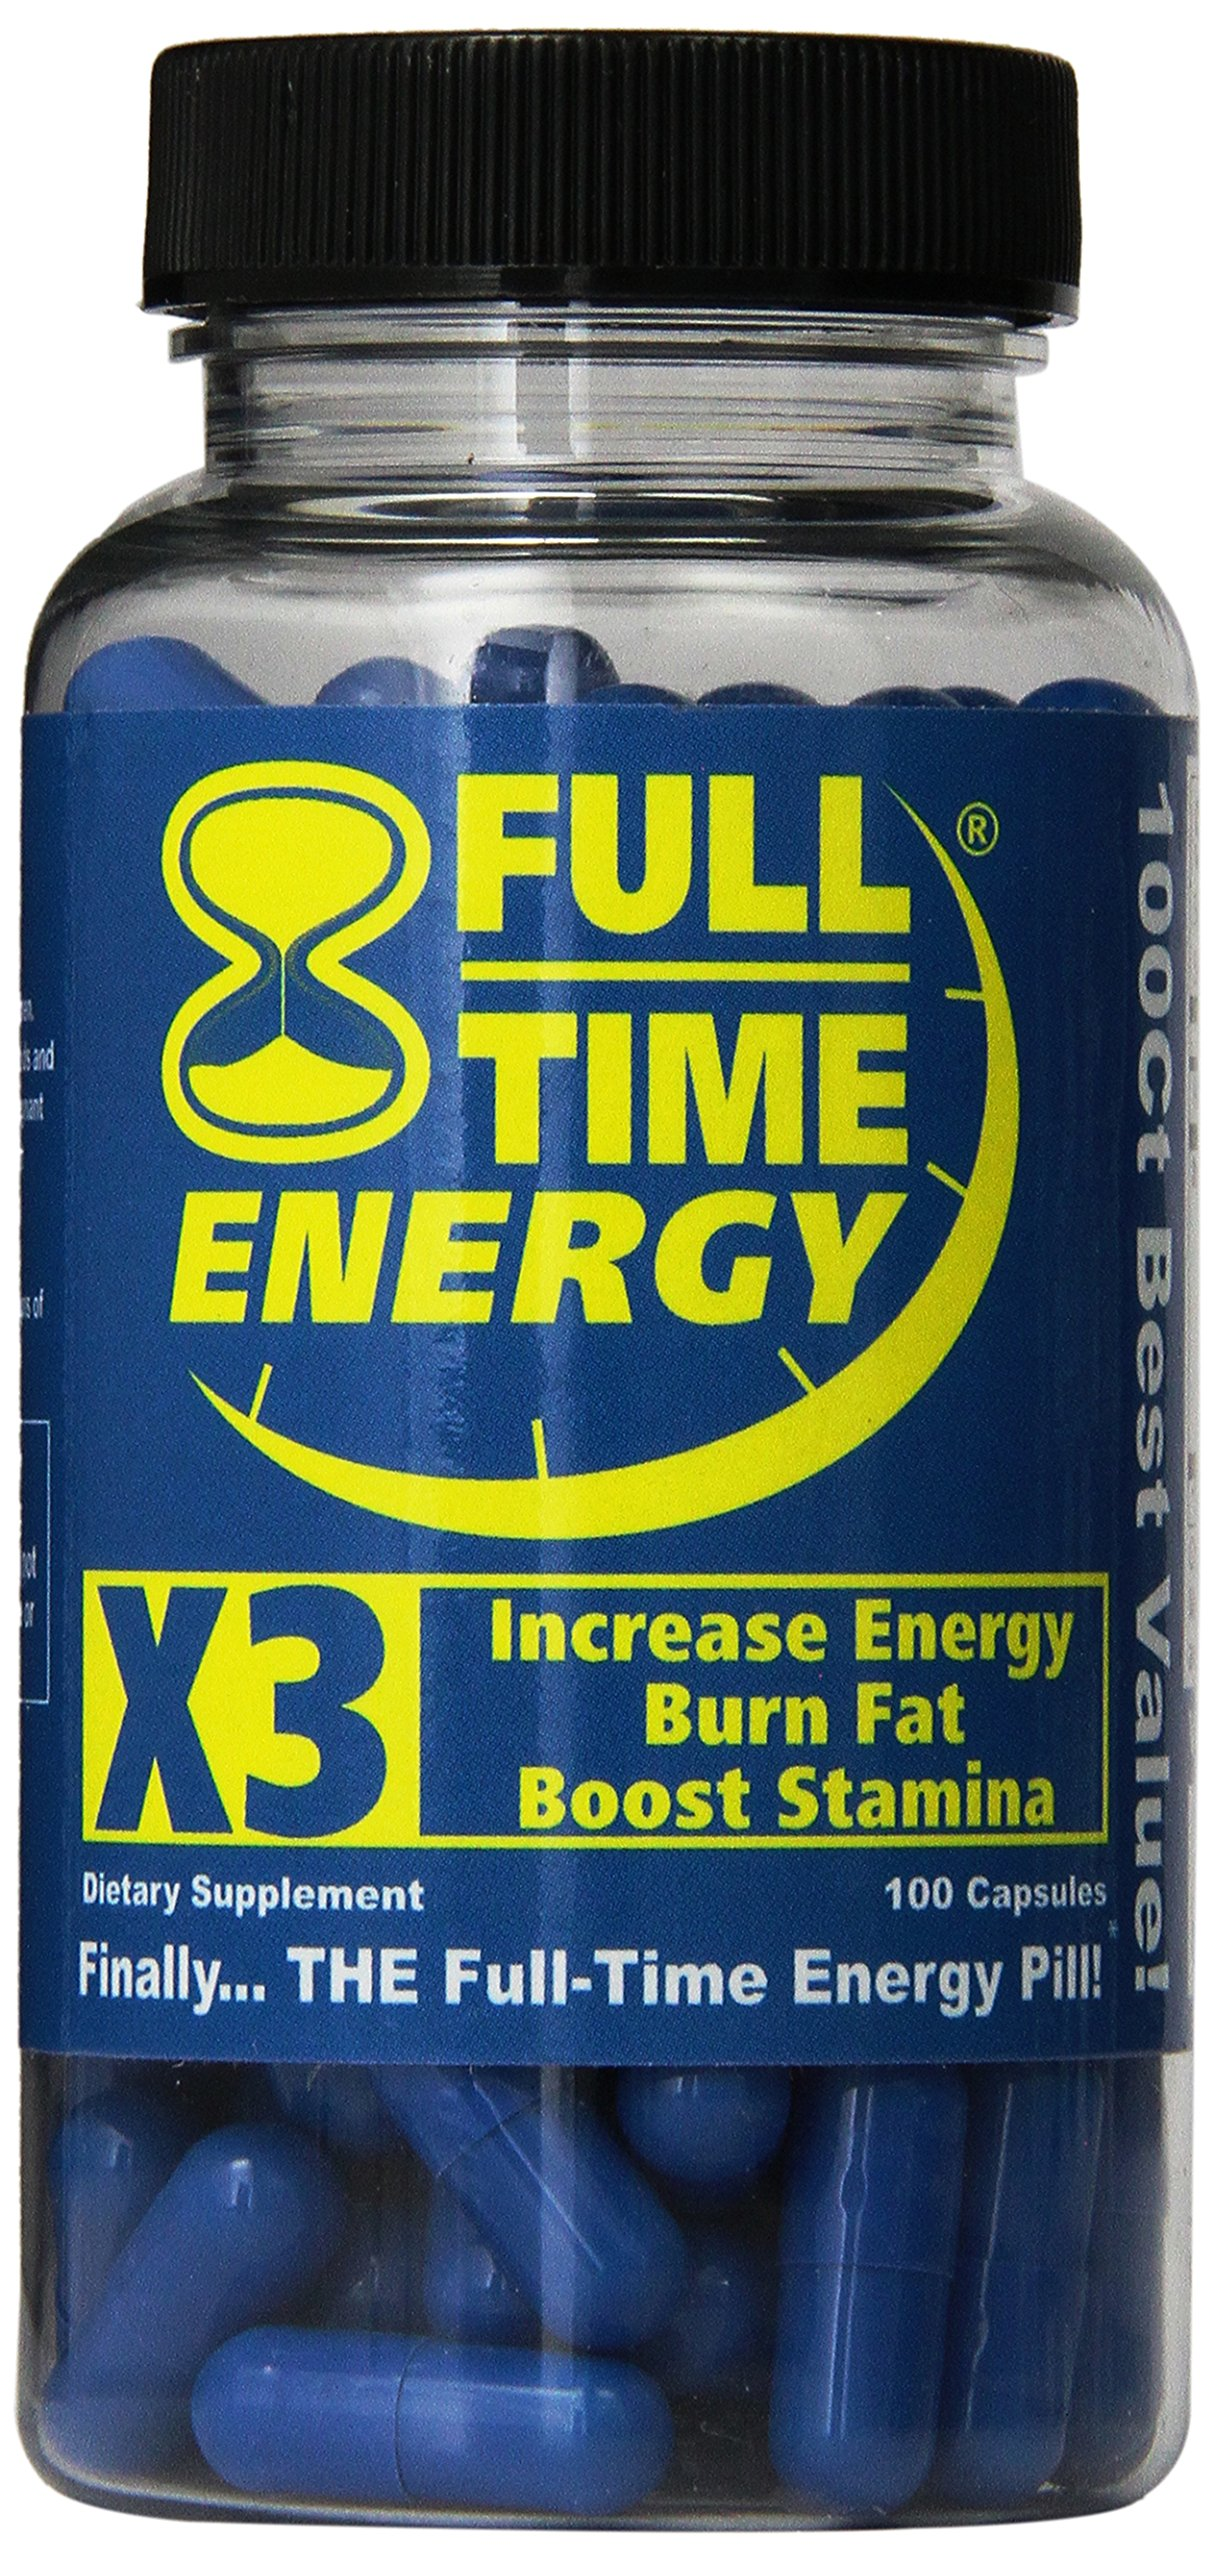 Amazon.com: Mr. ENERGY Maximum Strength ENERGY Pills 100